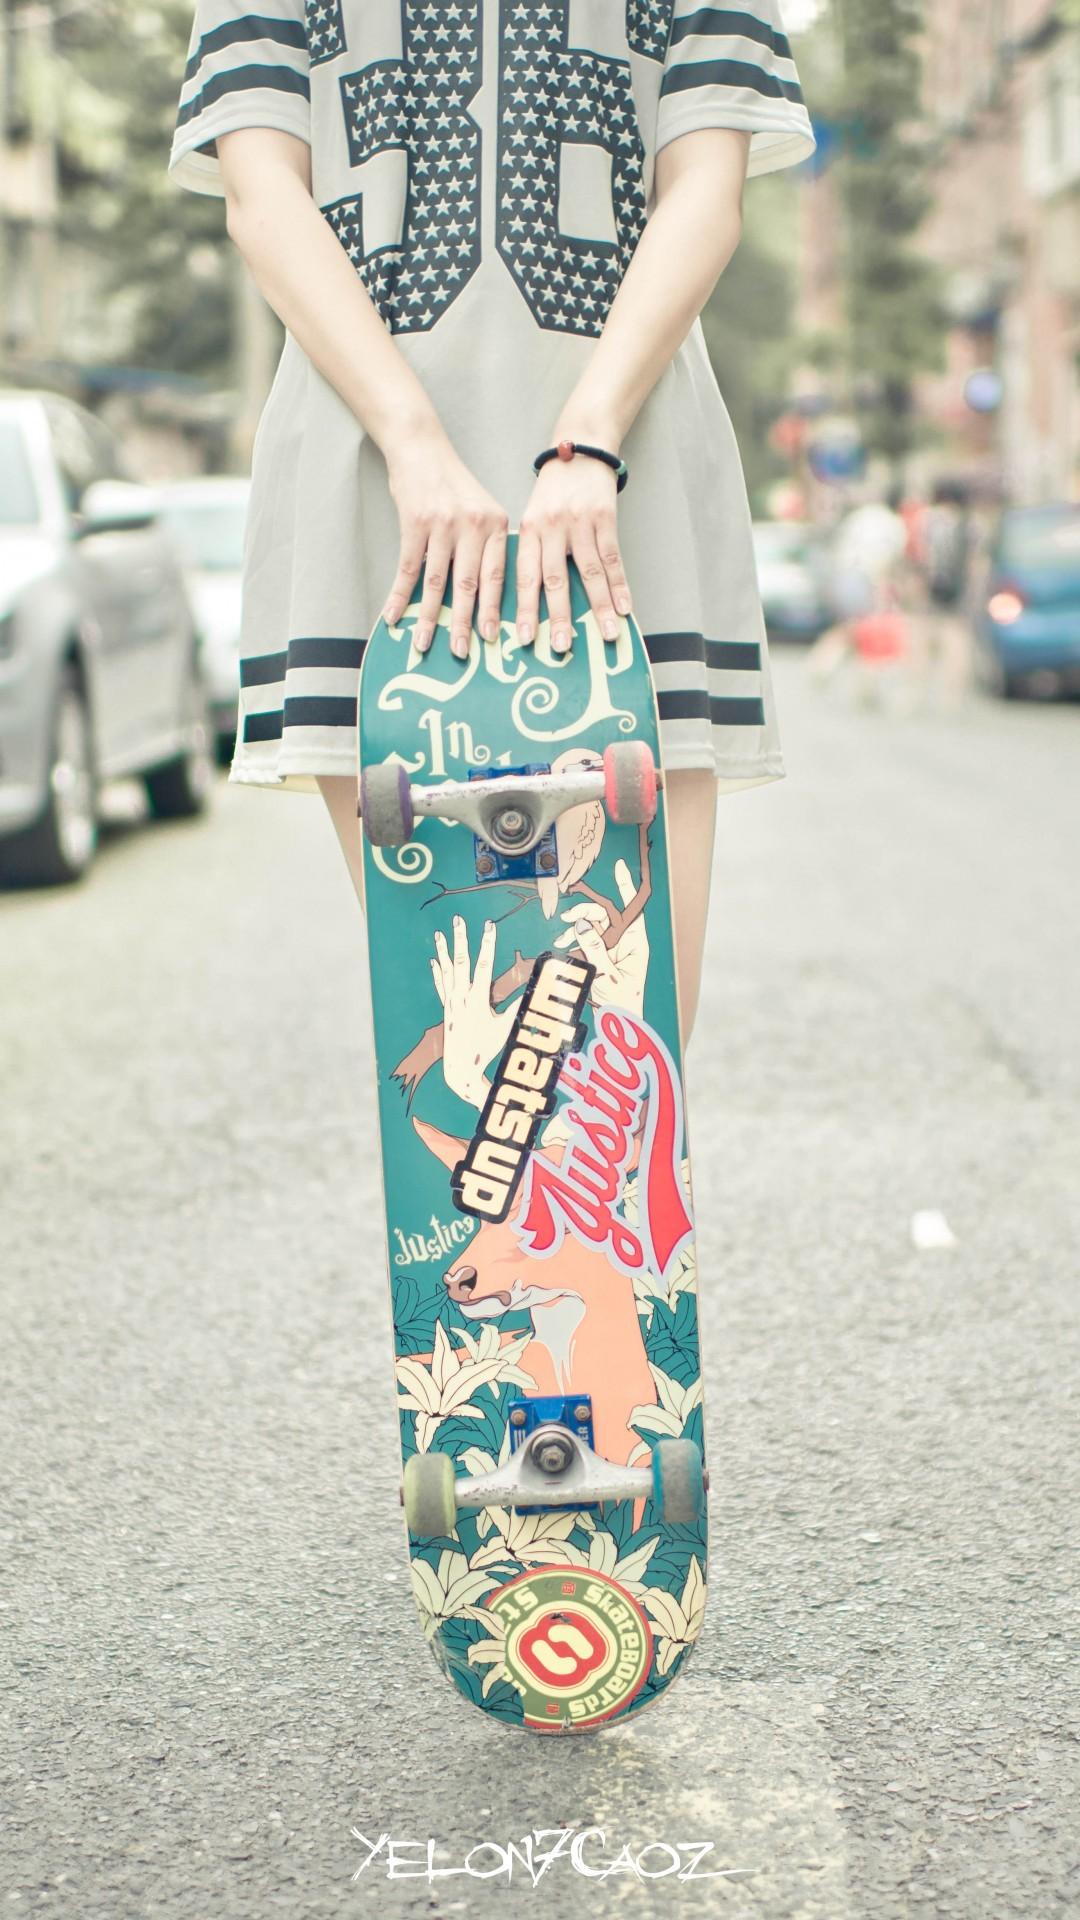 Skateboard Girl Wallpaper – Free iPhone Wallpapers